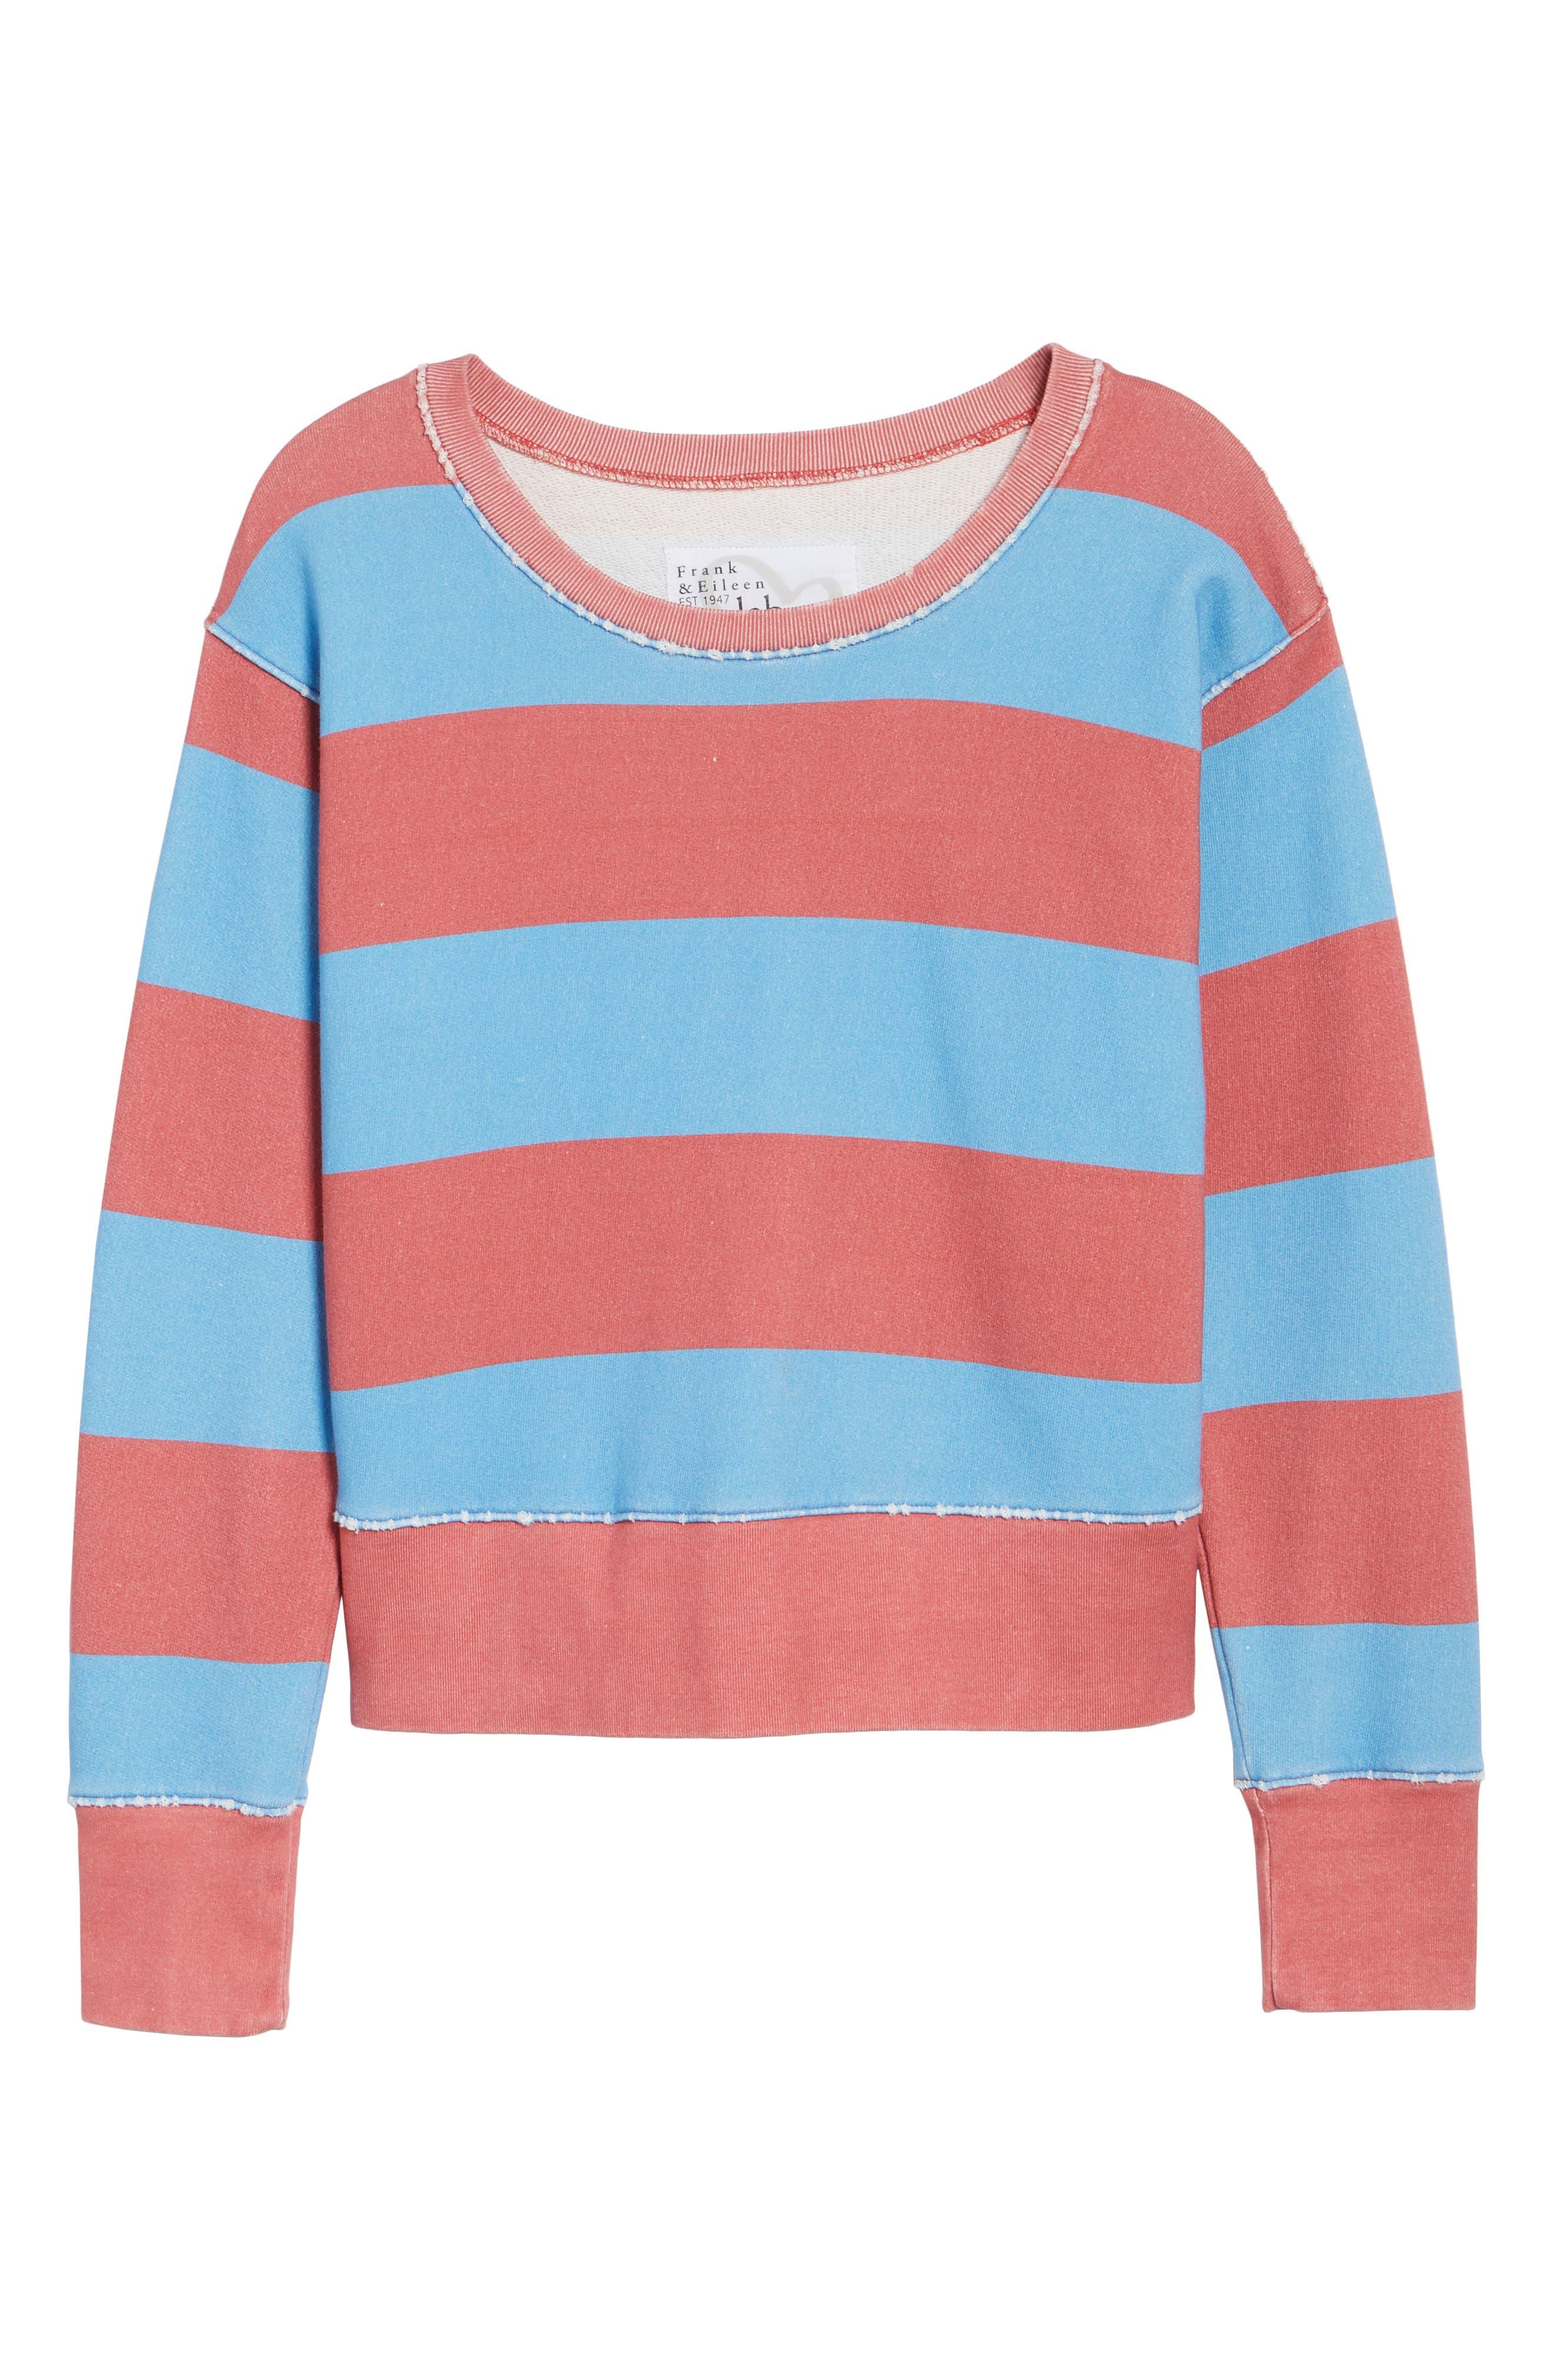 Stripe Crewneck Sweatshirt,                             Alternate thumbnail 7, color,                             Red Rugby 5 Vintage Year Wash